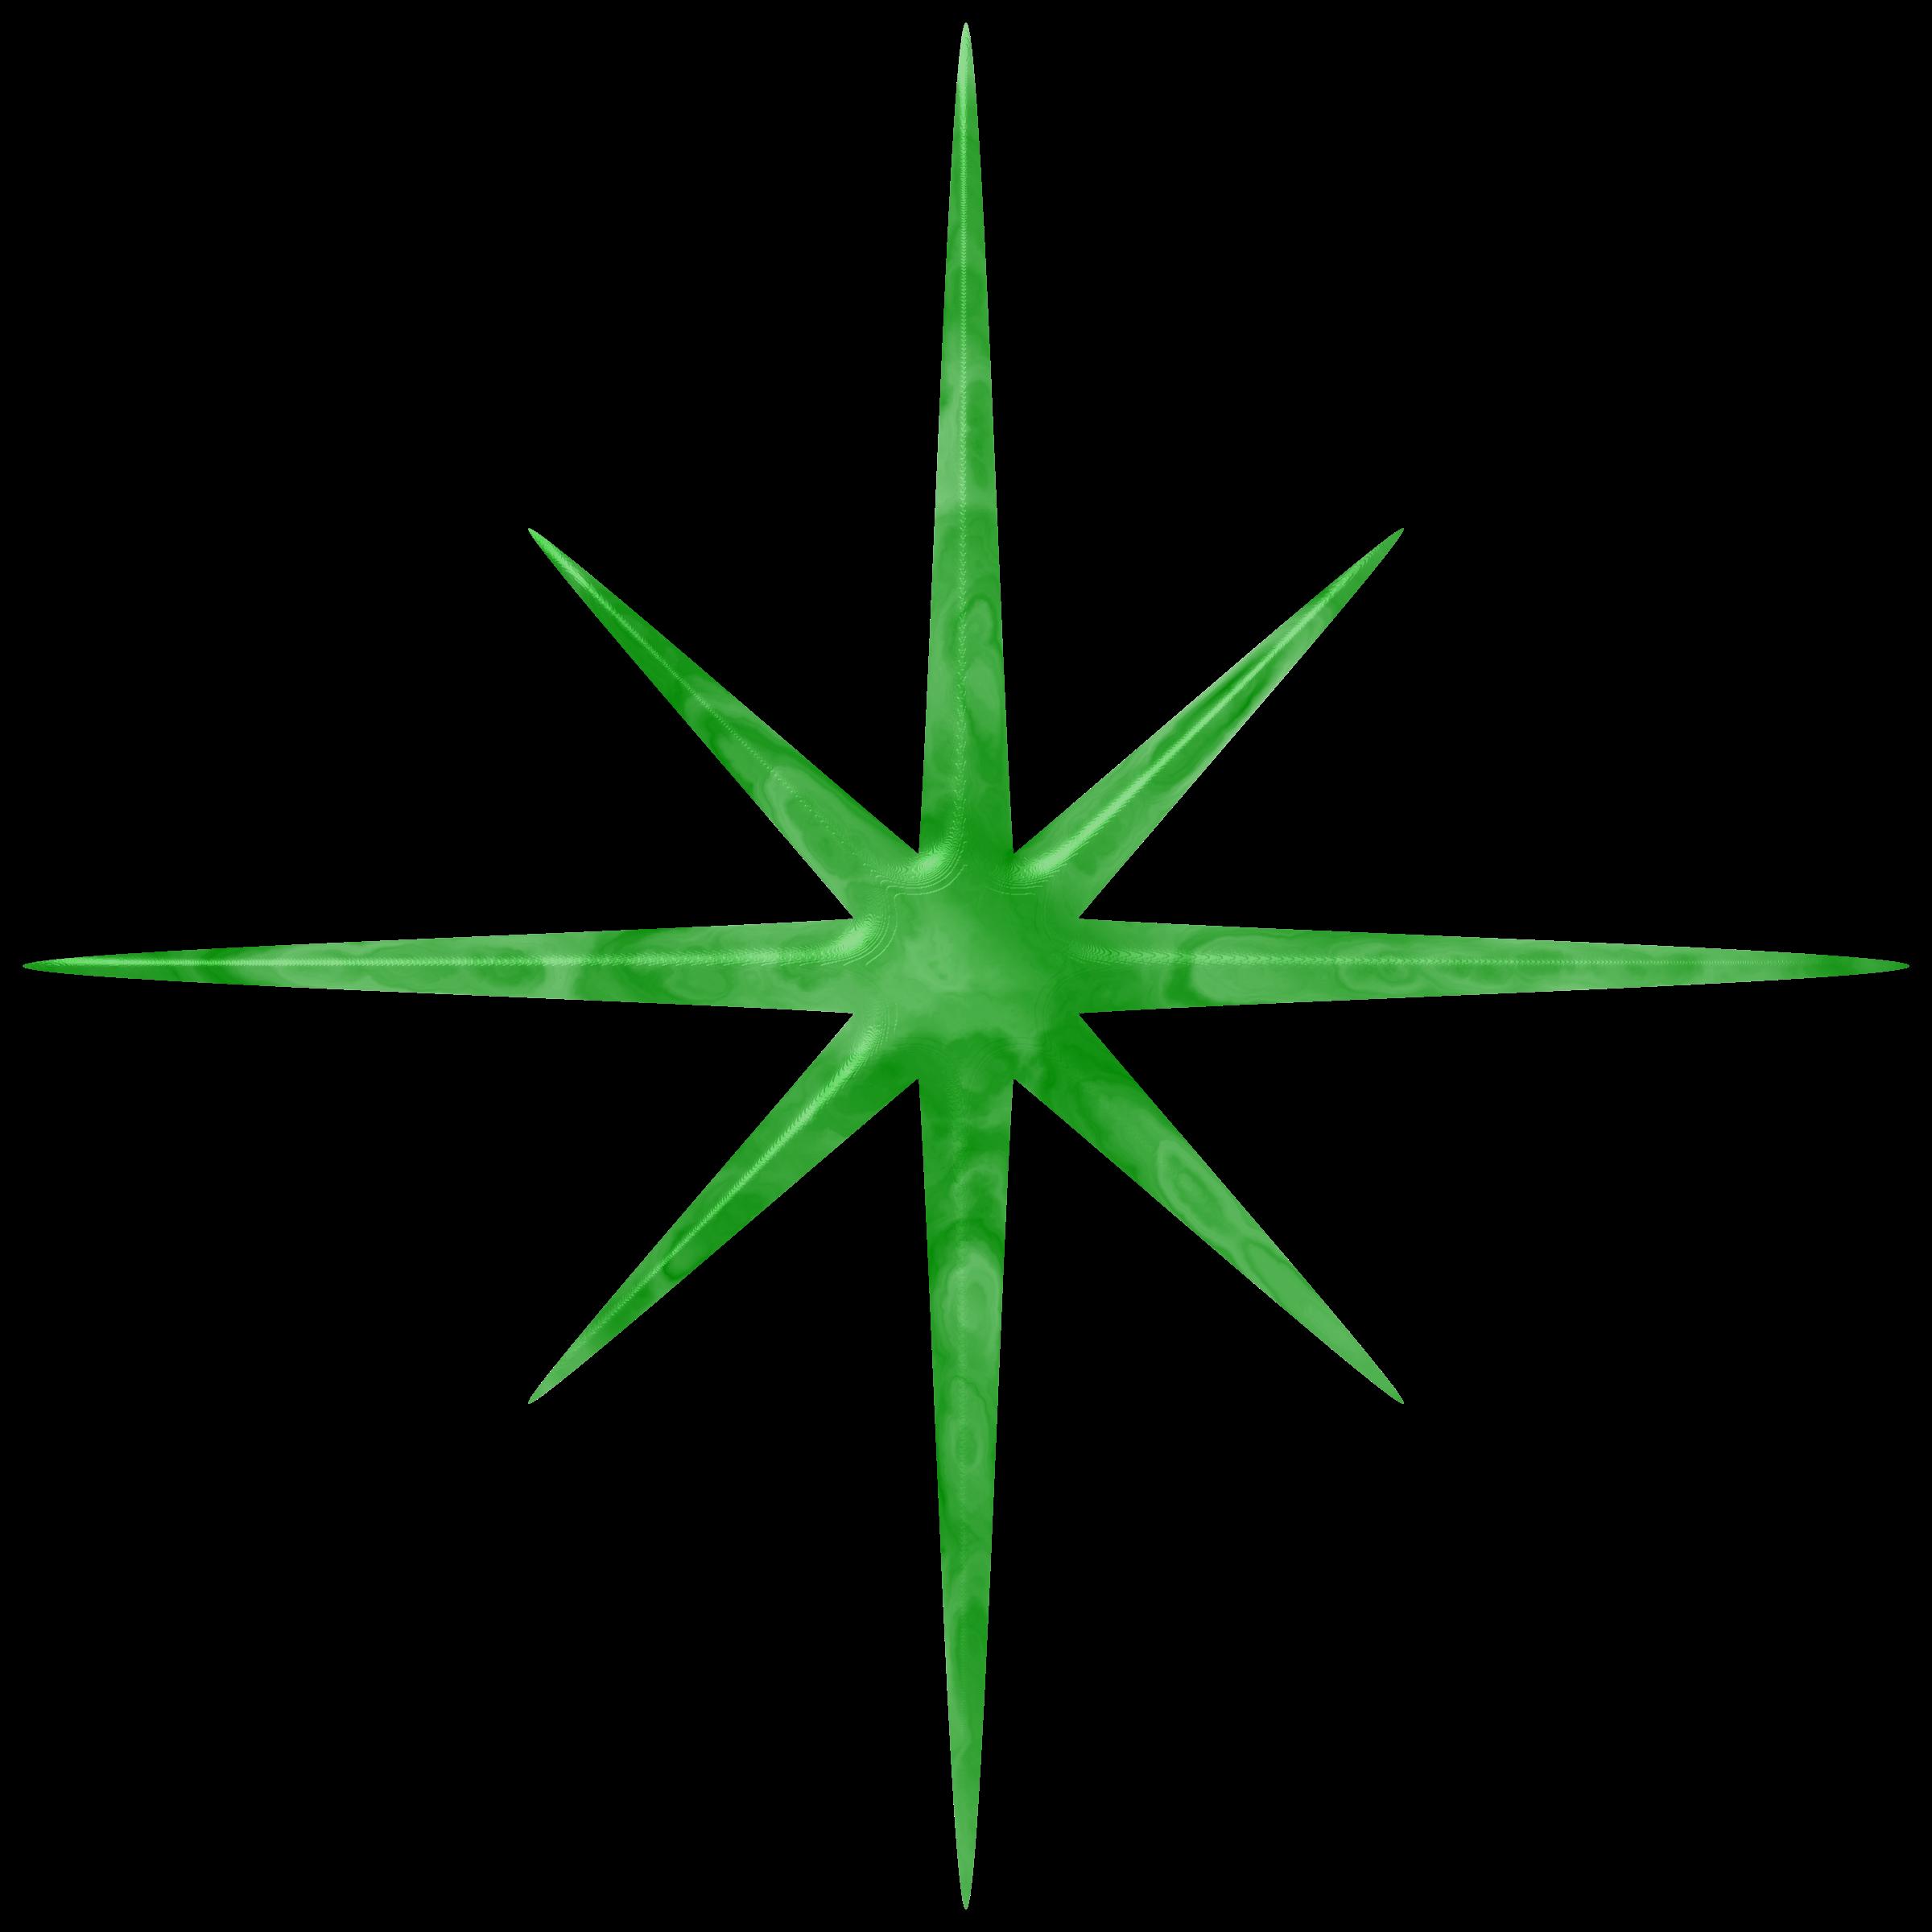 Jade star big image. Sparkle clipart green